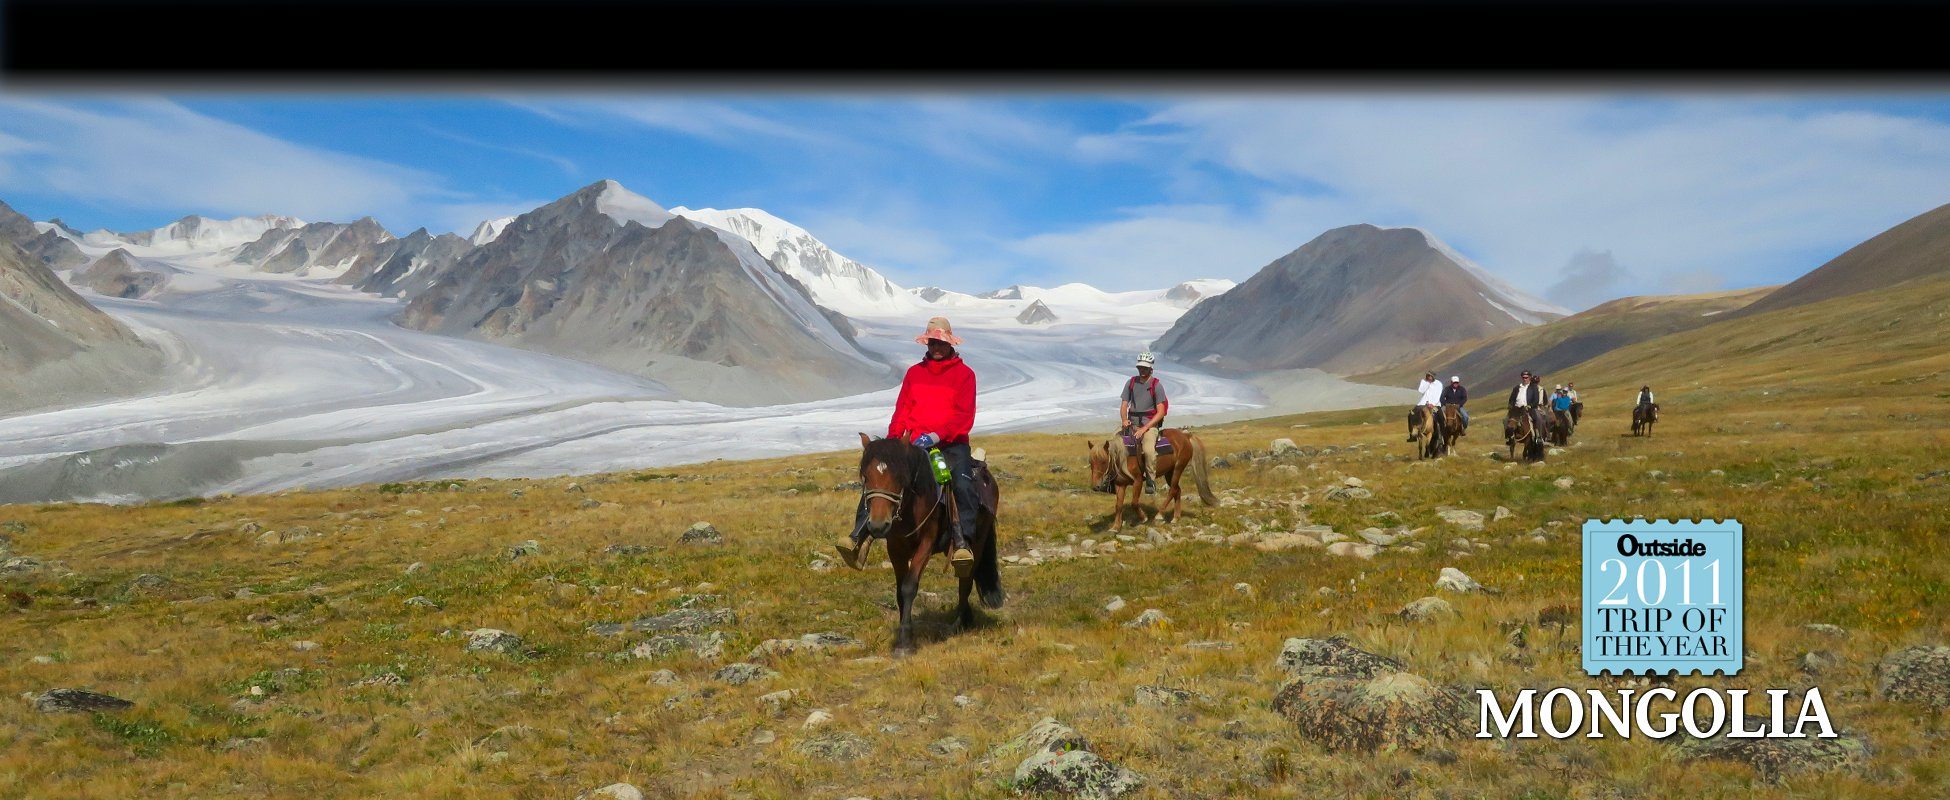 Mongolia Trek About